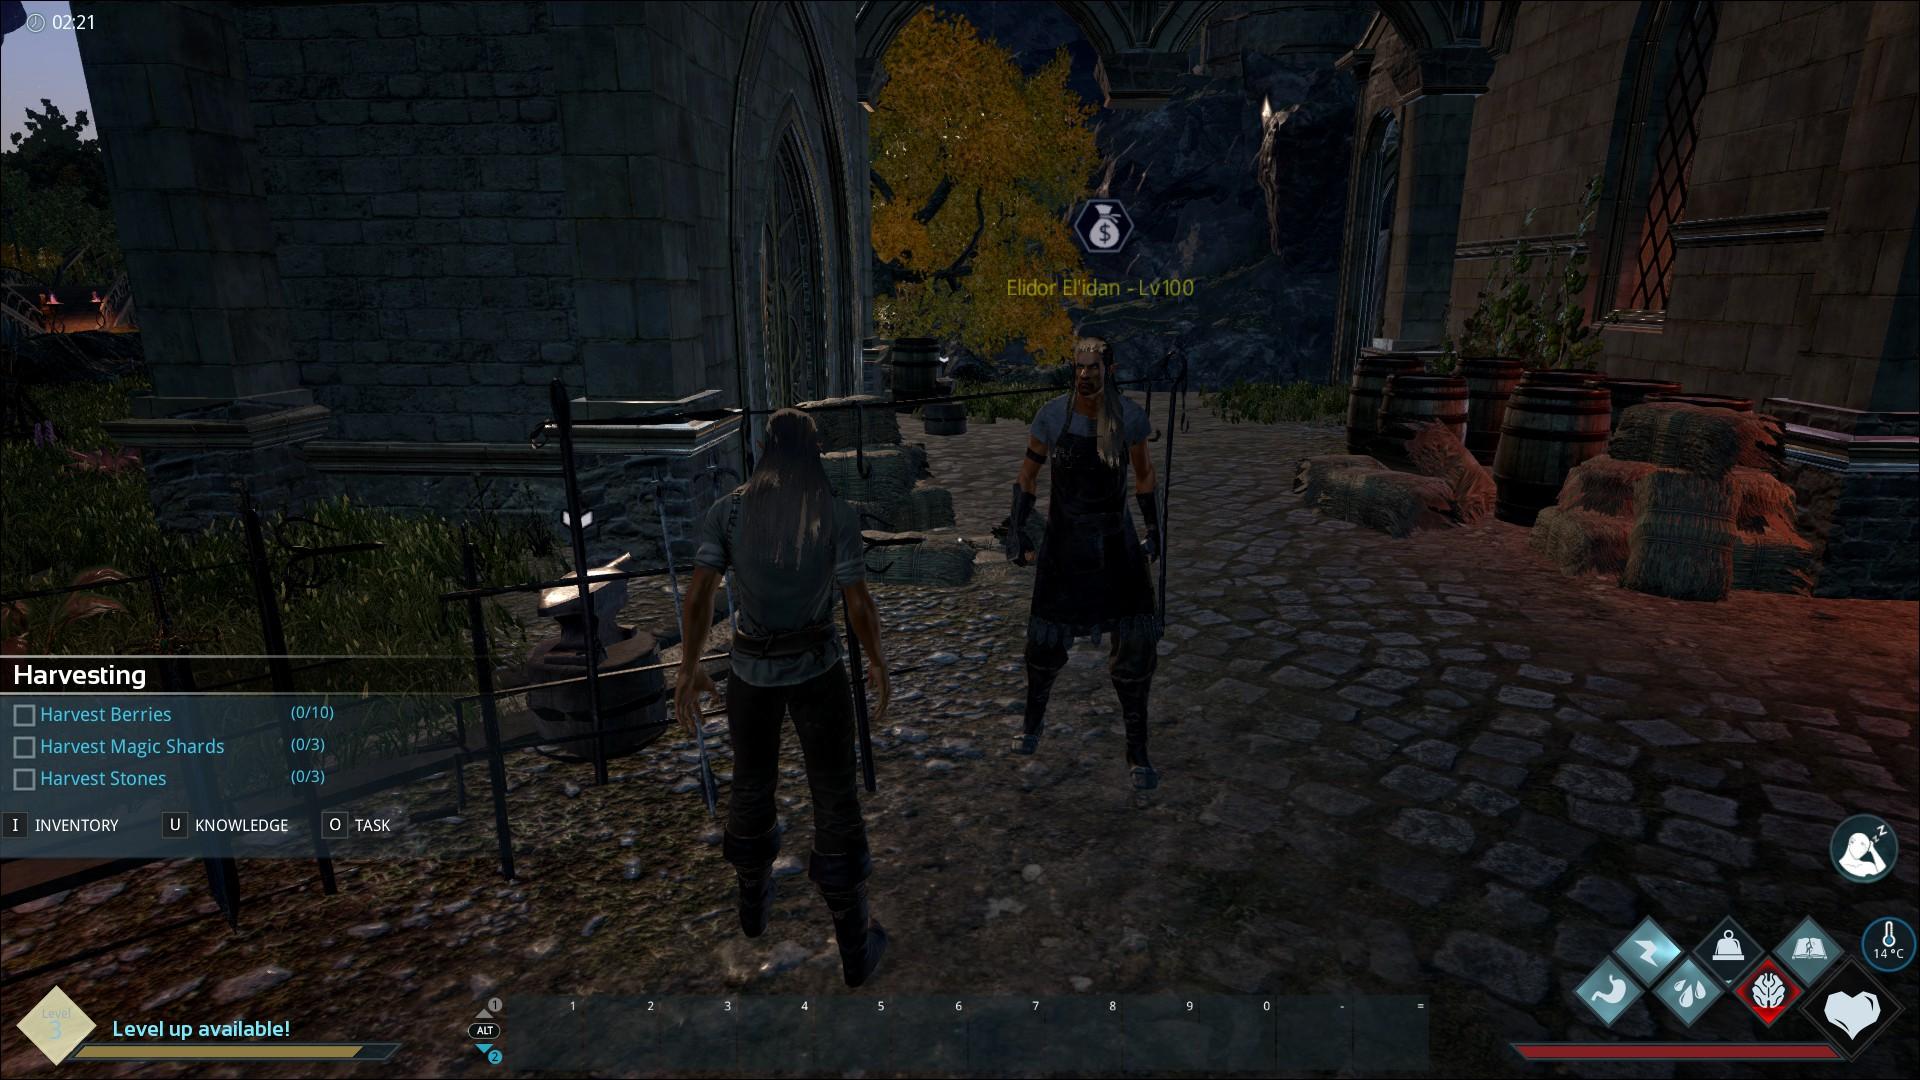 Steam community guide town npc blueprint pathways cheat spawndino blueprintgamemodsdarkandlightobjectnpcmalenpcm2104npcm2104busicharacterbpcm2104busicharacterbp 1 1 1 120 malvernweather Image collections